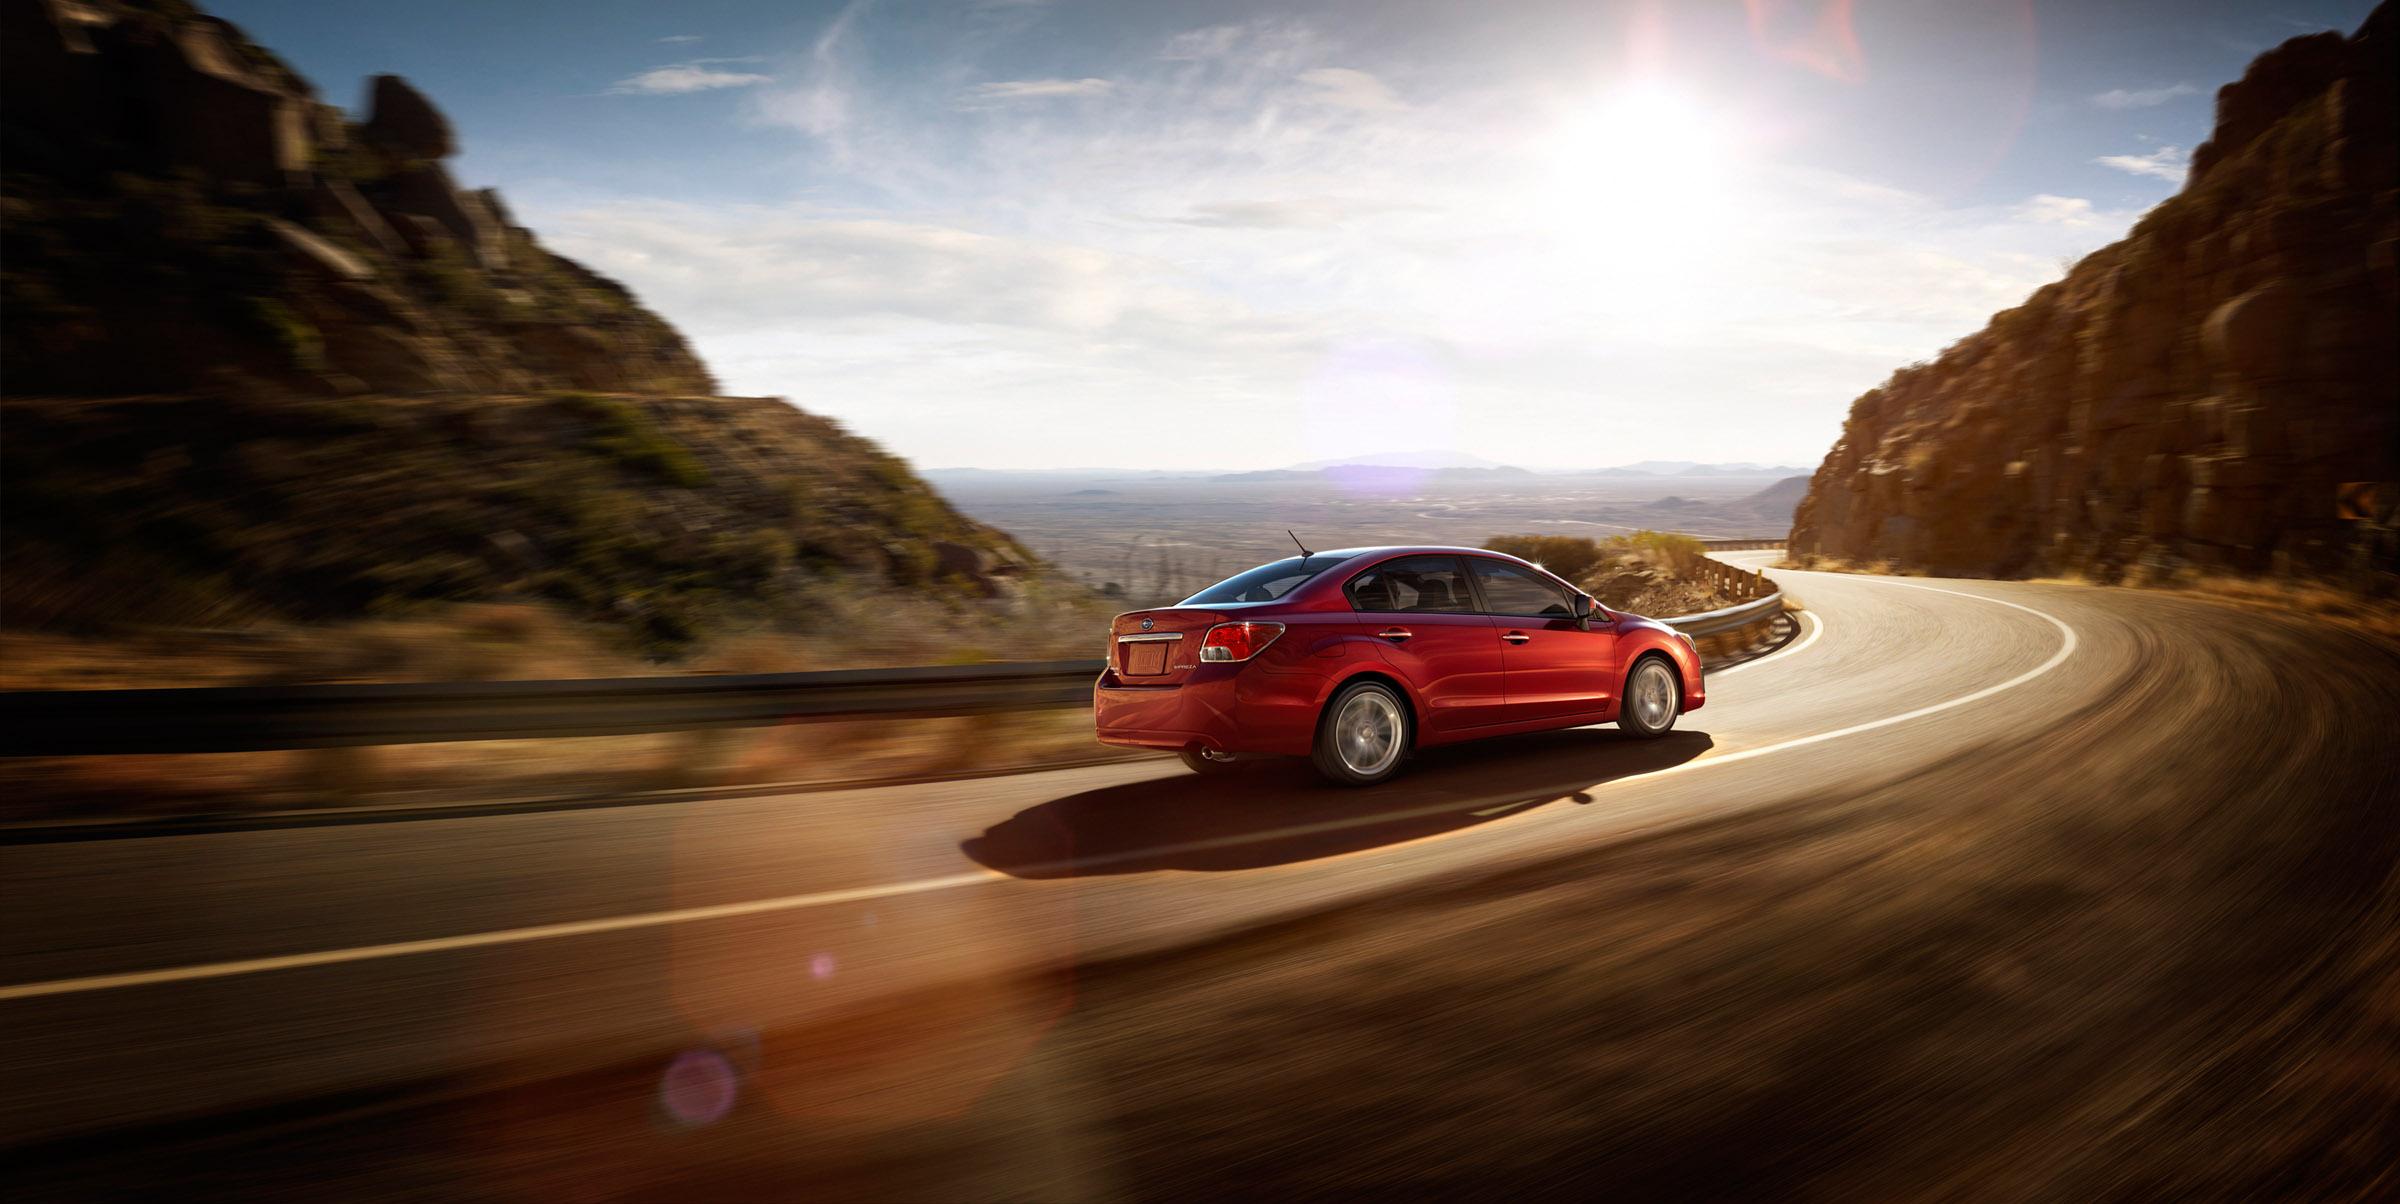 2012 - Subaru Impreza 2-0i лимитированная четвертая версия (фотографии) - фотография №4